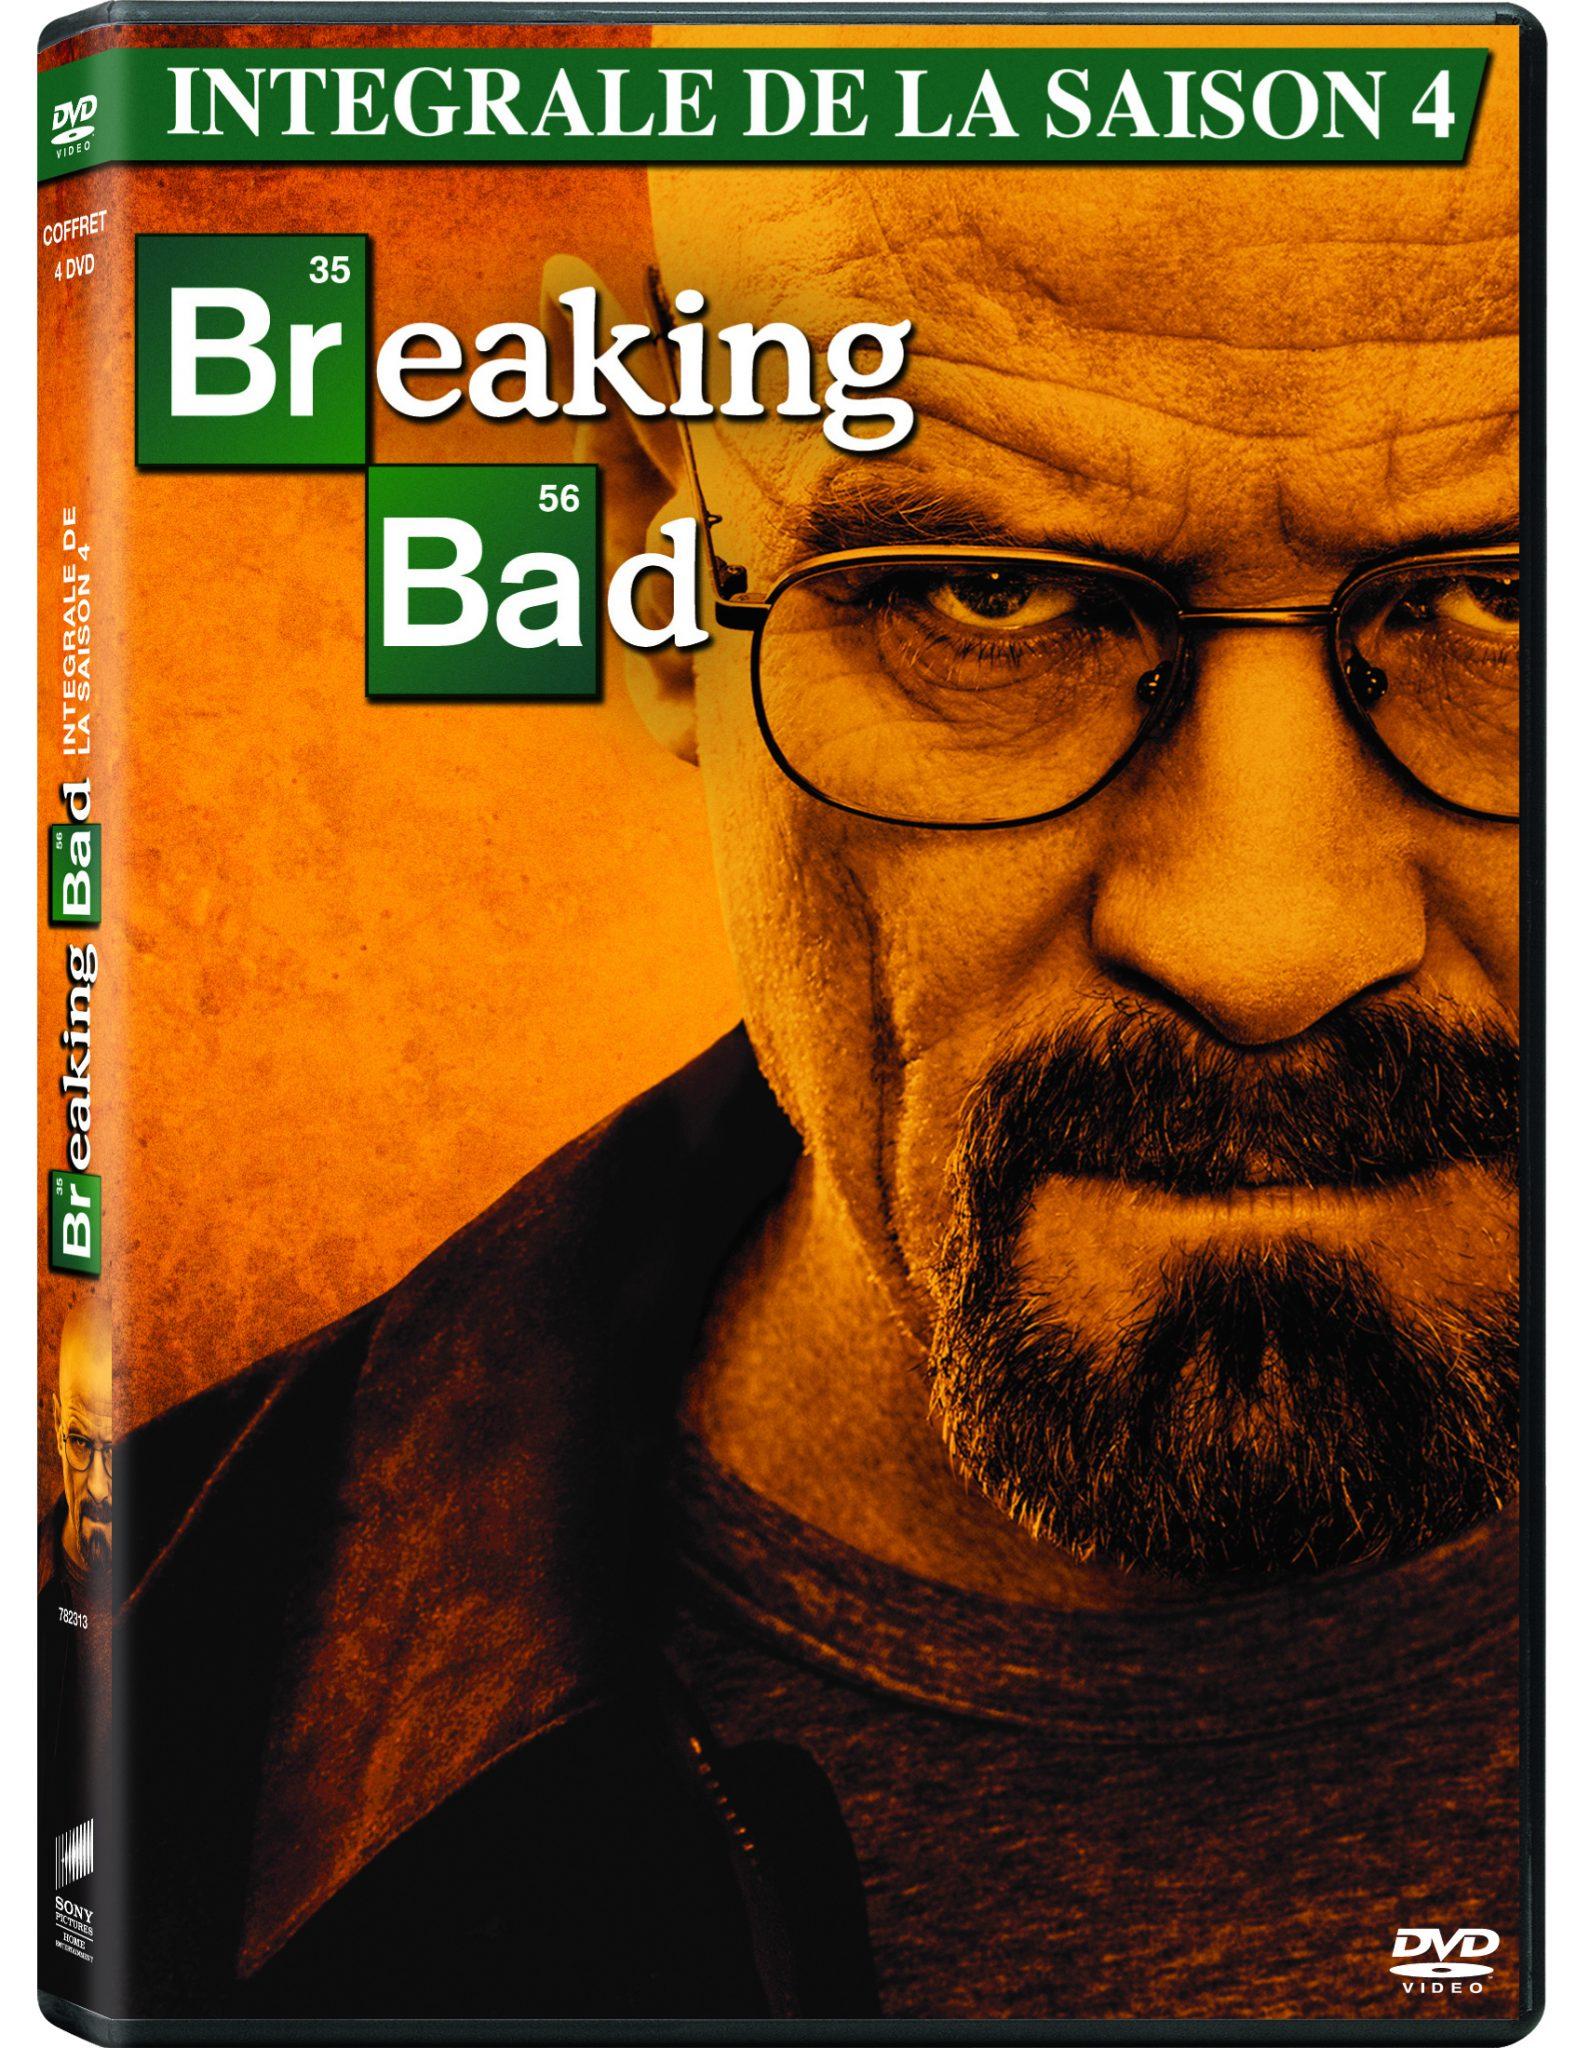 saison 4 breaking bad en dvd mademoiselle bon plan